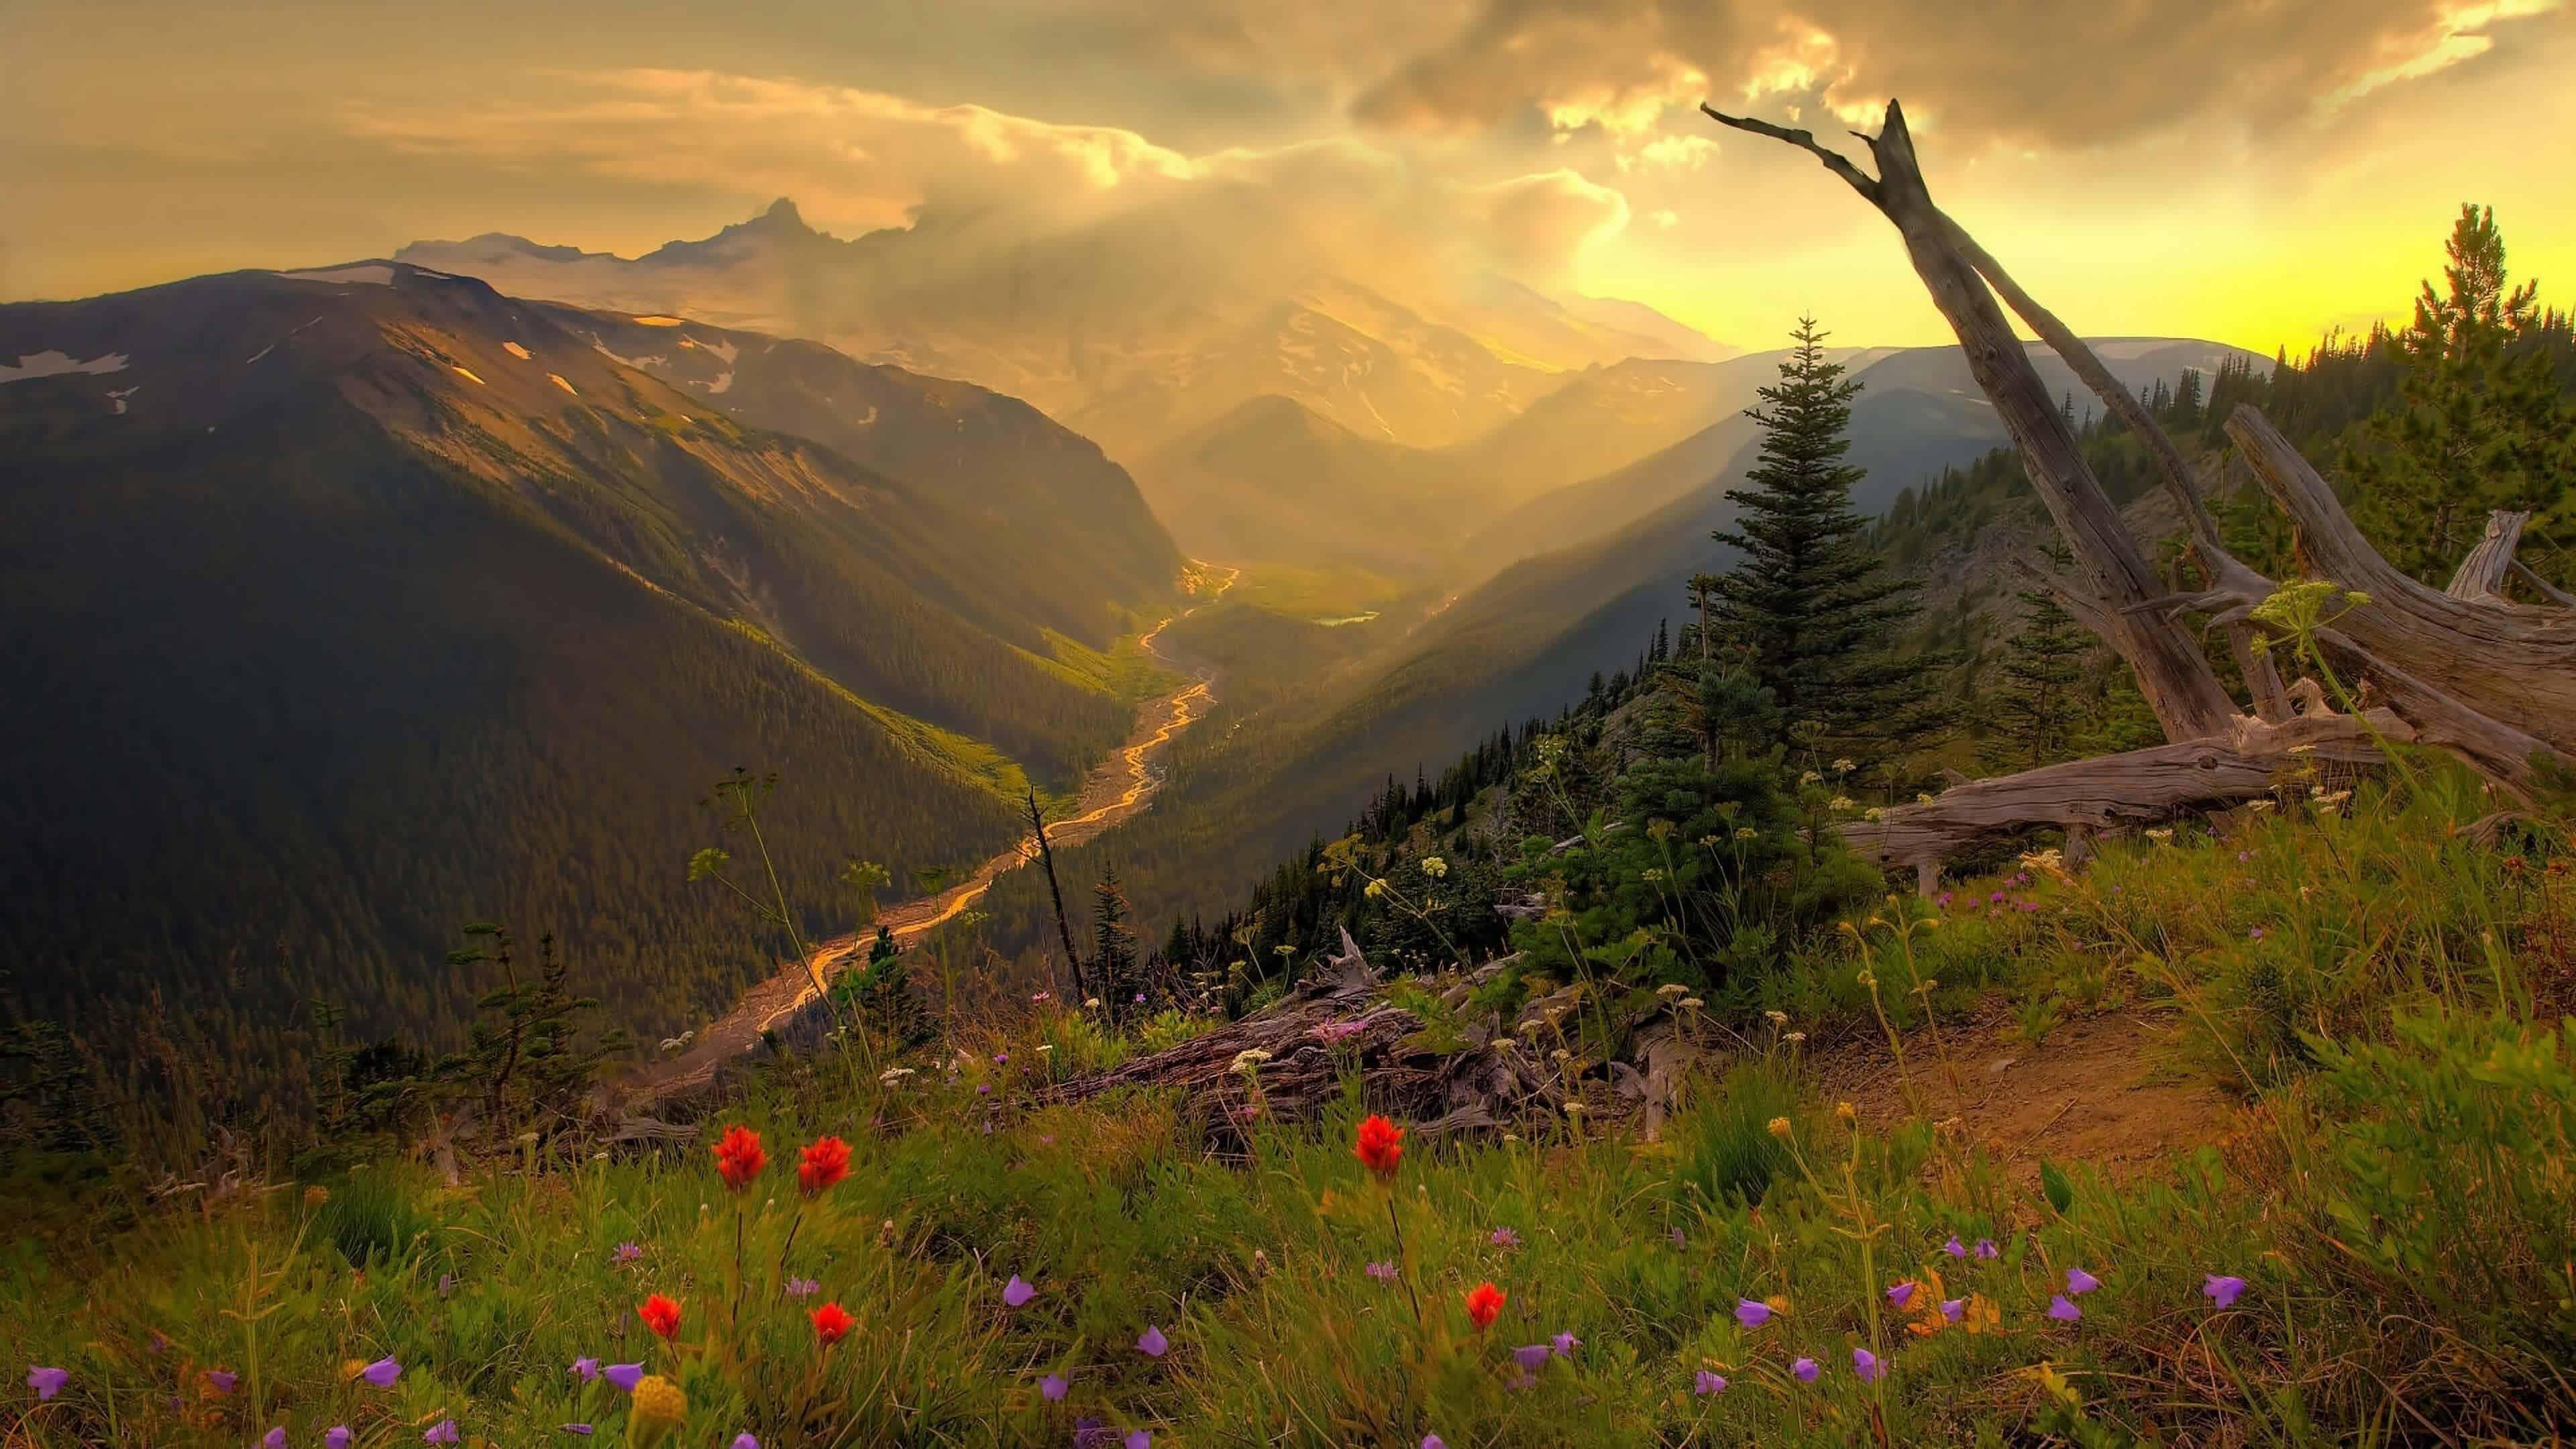 Unreal Engine 4 Landscape UHD 4K Wallpaper | Pixelz